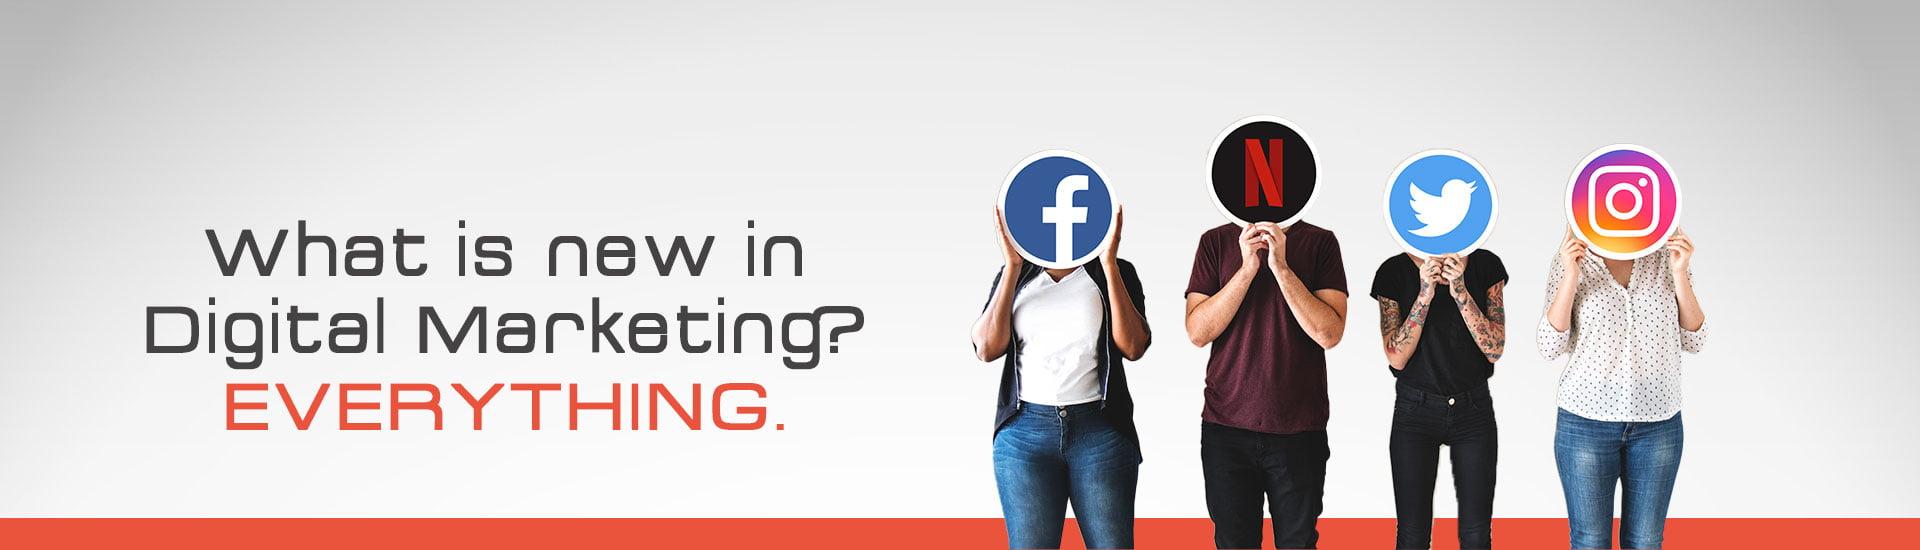 social media advertiser in Gurgaon